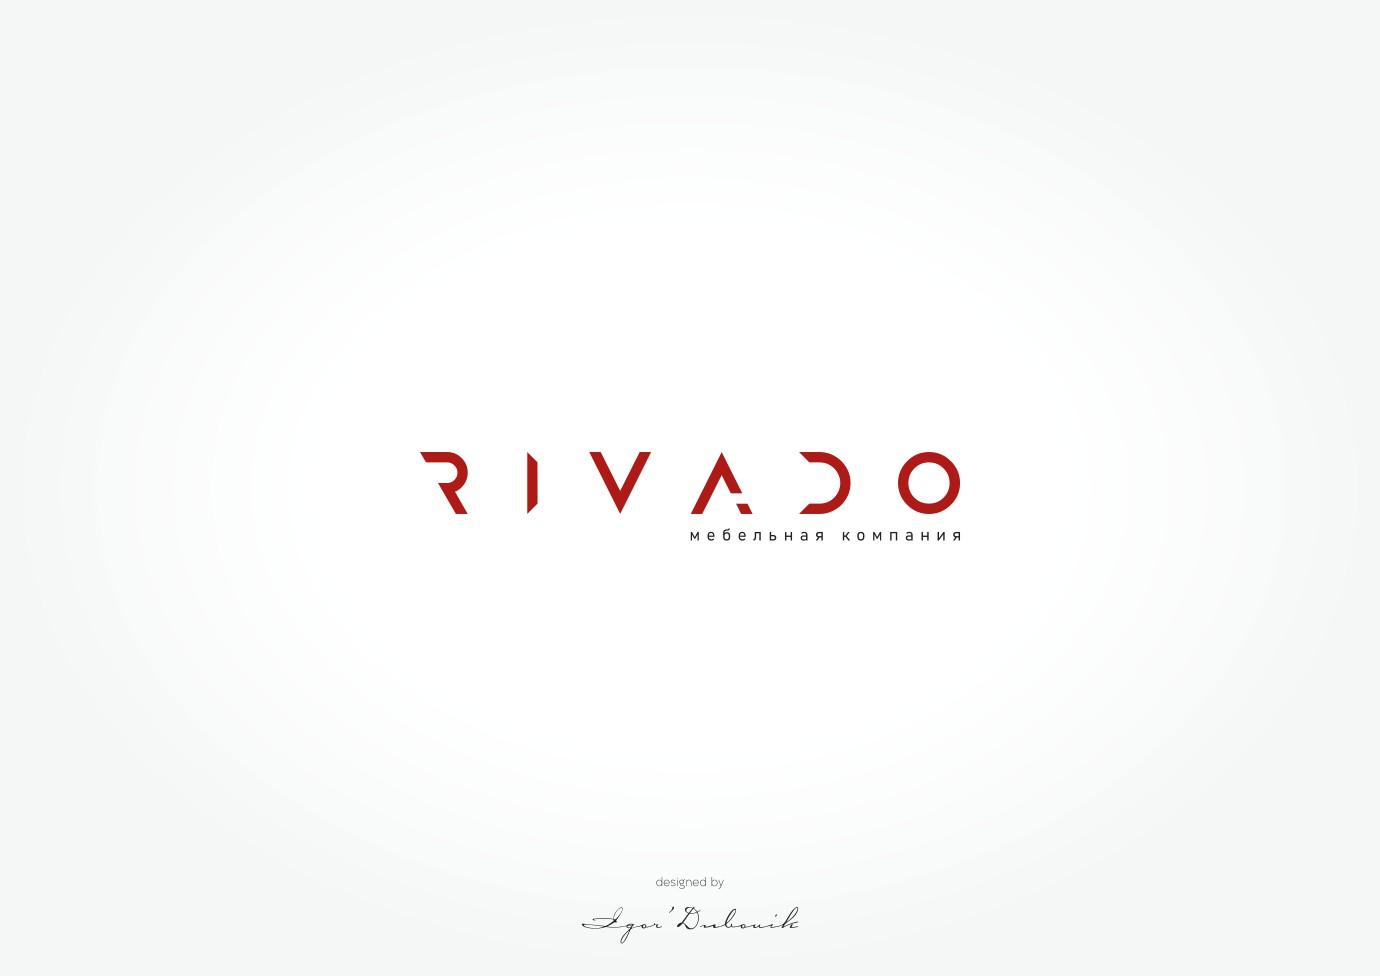 RIVADO